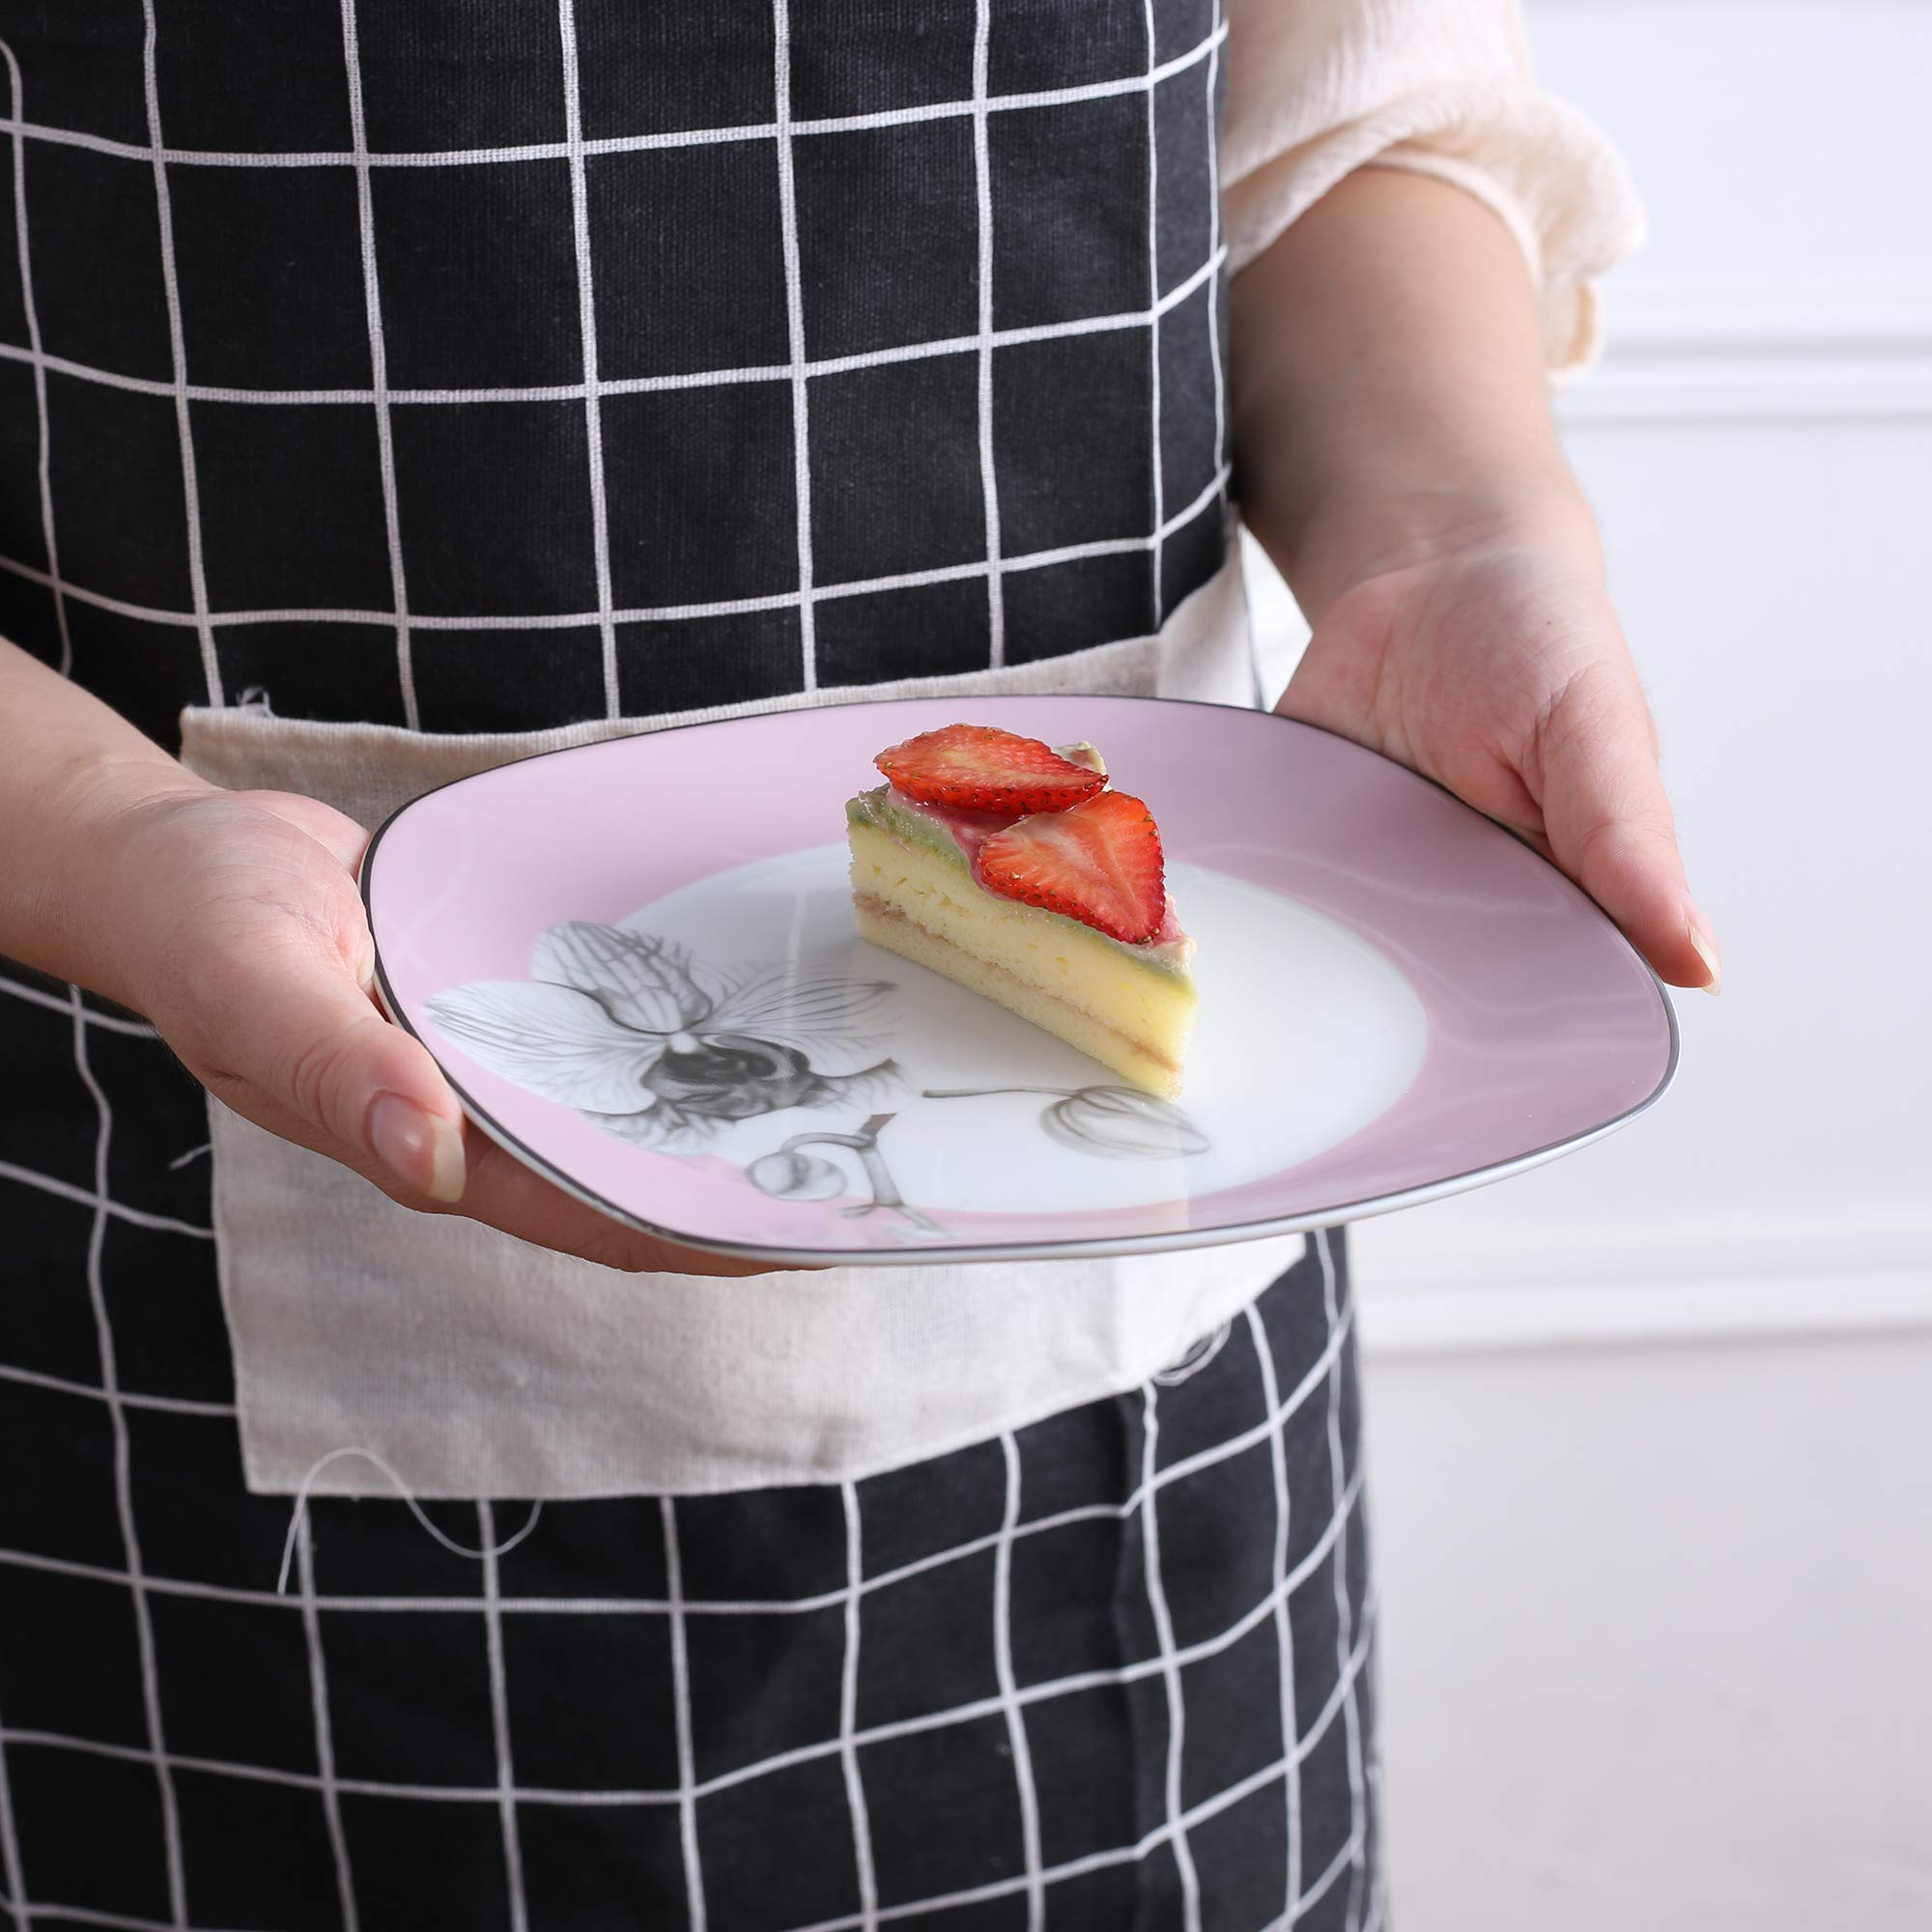 VEWEET 4-Piece Porcelain Dessert Plate Set, Durable Ivory White Bread 7-1/2 Inch Salad Plates DEBBIE Series by VEWEET (Image #4)